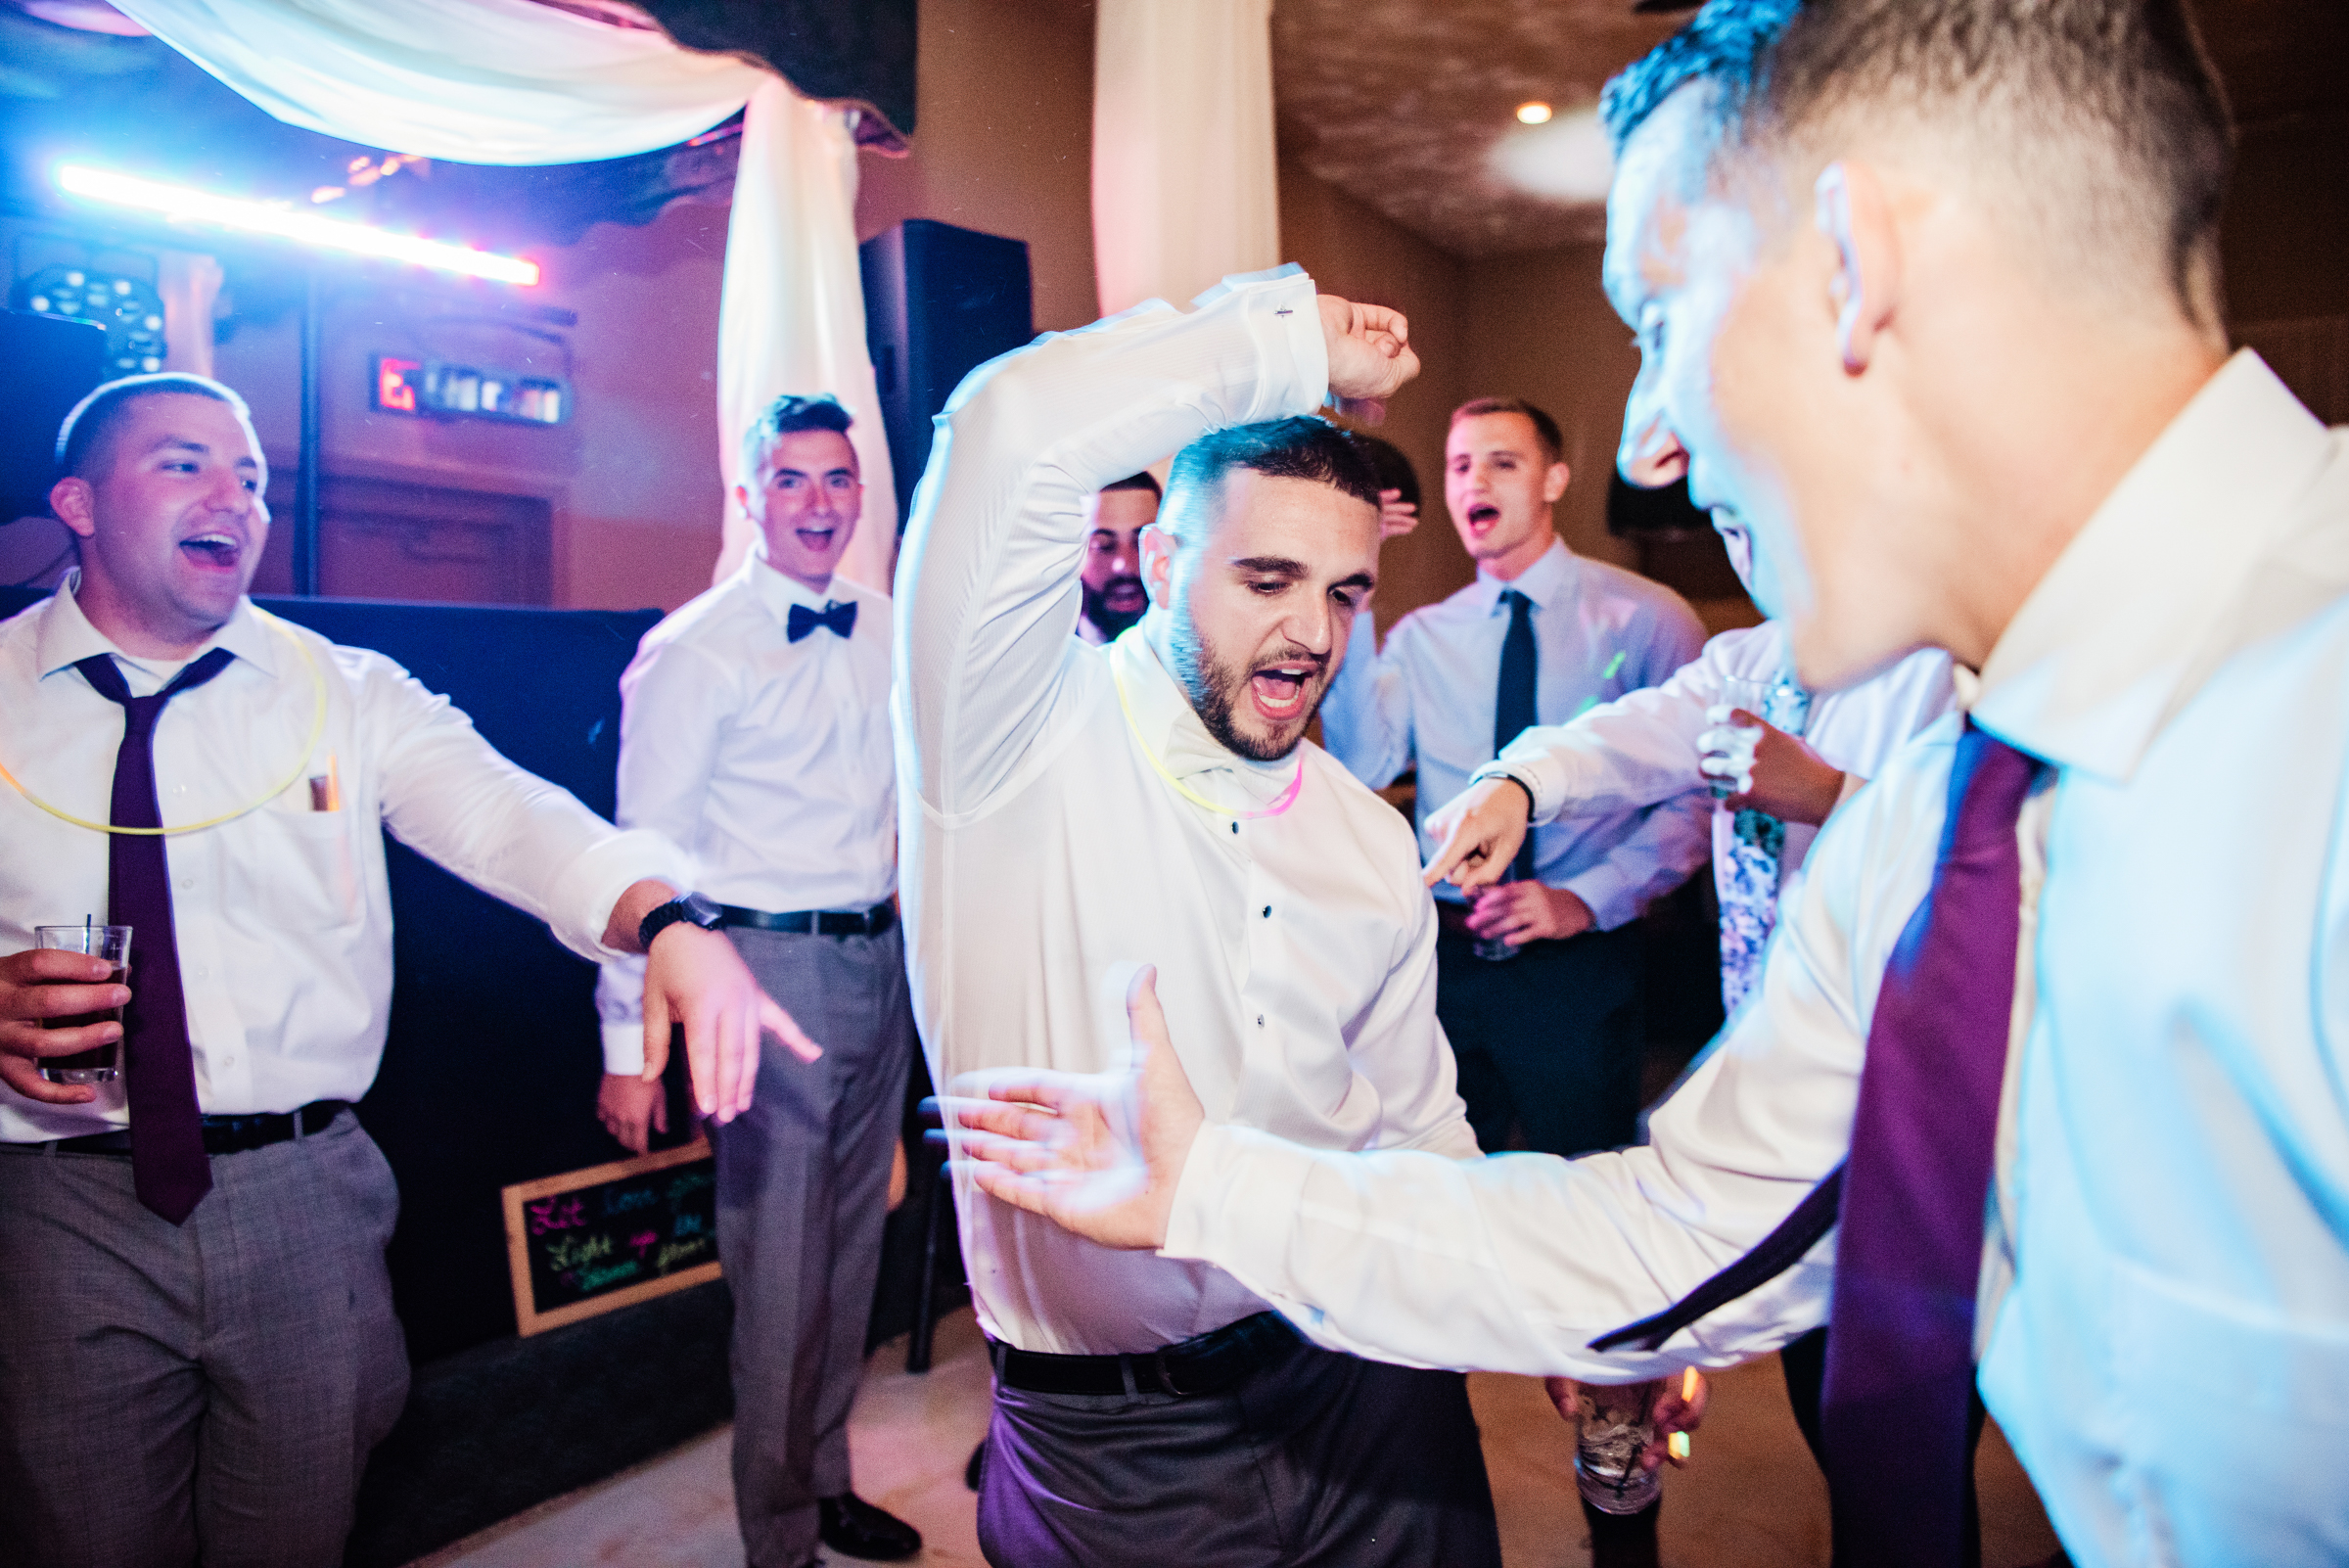 Historic_Old_St_Johns_Church_Valentinos_Banquet_Hall_Central_NY_Wedding_JILL_STUDIO_Rochester_NY_Photographer_DSC_7106.jpg